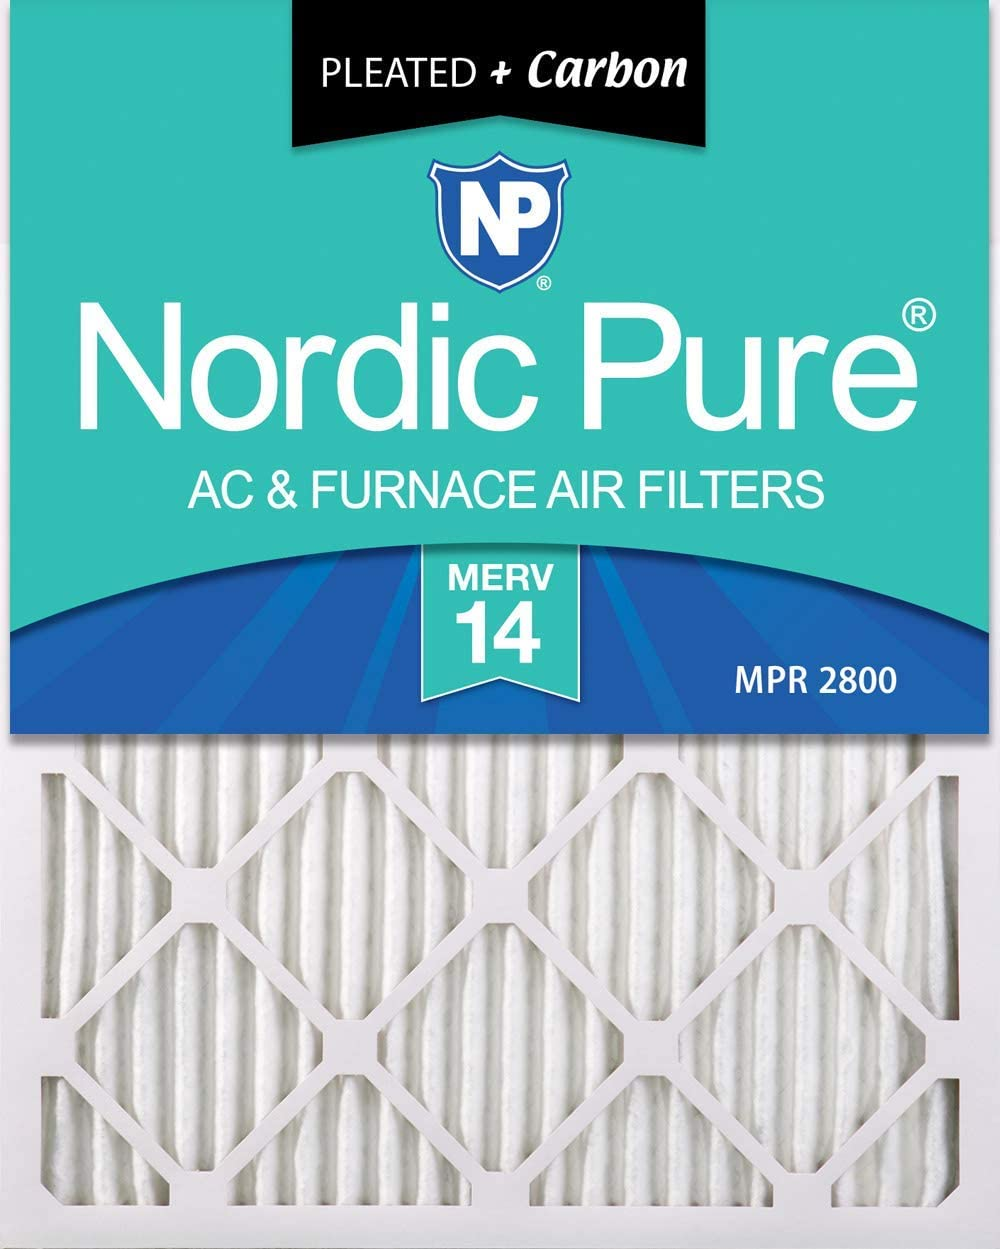 Nordic Pure 18x25x1 MERV 10 プリーツAC炉エアフィルター (改良済み) 18x25x1M14+C -6 18x25x1M14+C-6-cr 6